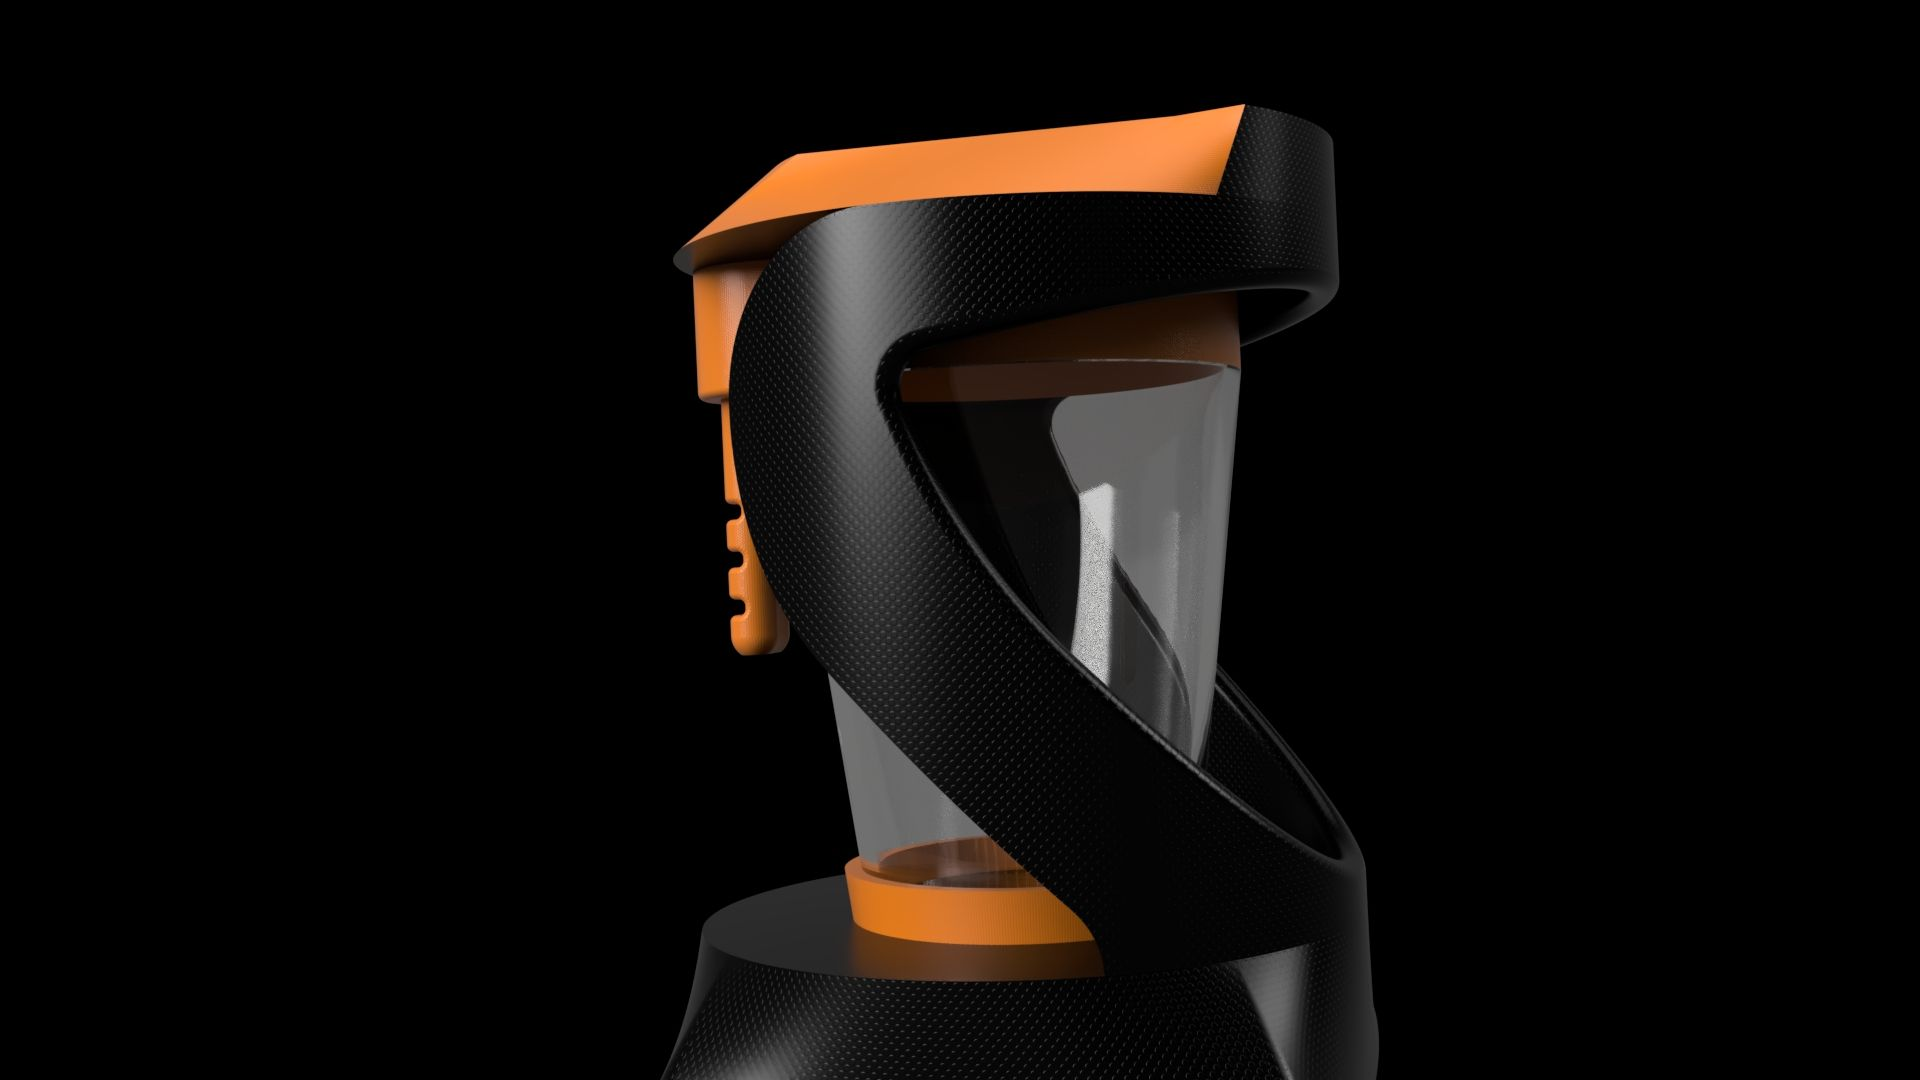 Liq-design-lcs2018-fabrica-de-nerdes-8-3500-3500